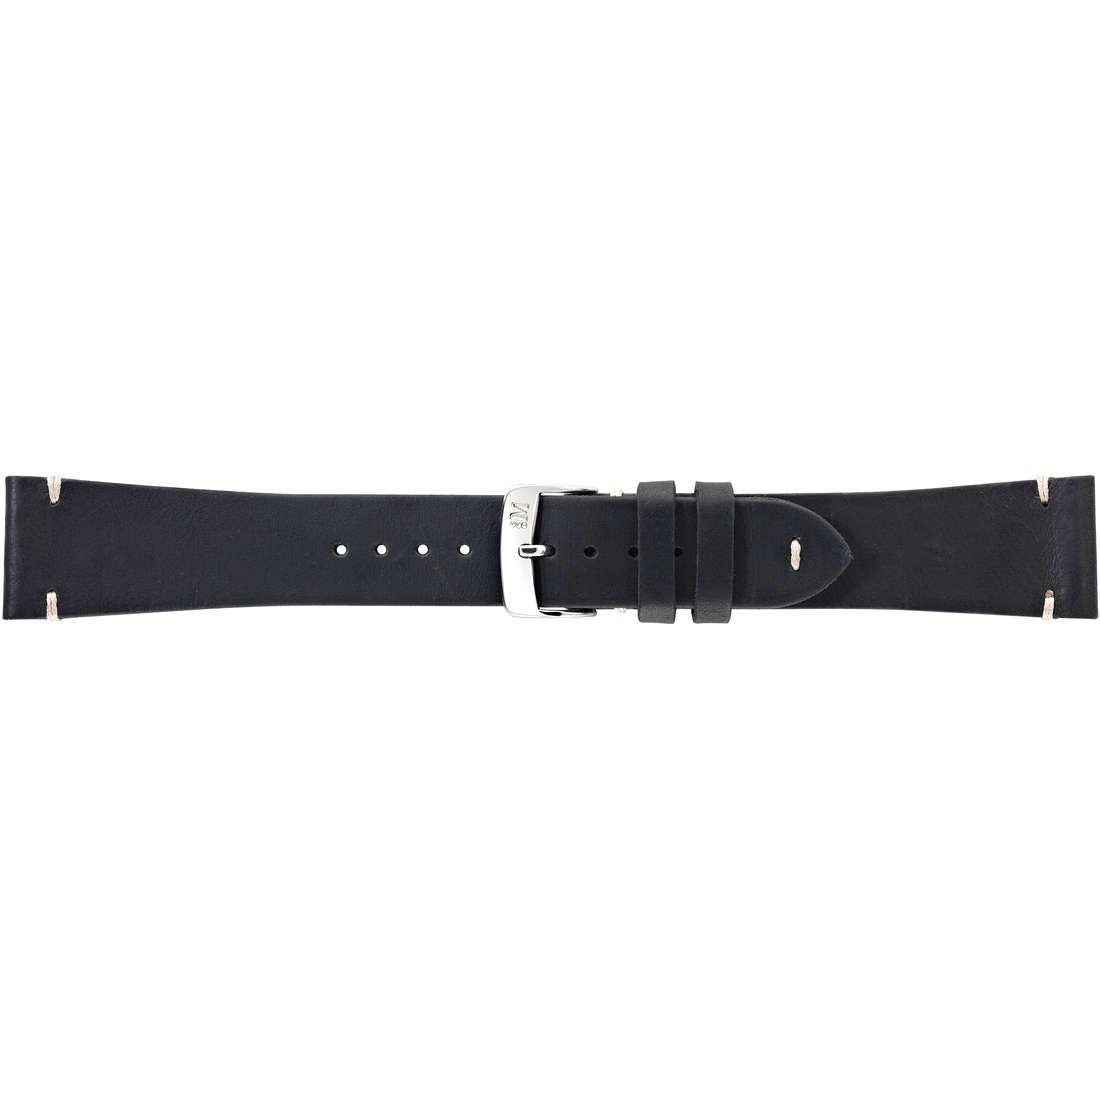 watch watch bands watch straps man Morellato Manufatti A01X4541A76019CR20